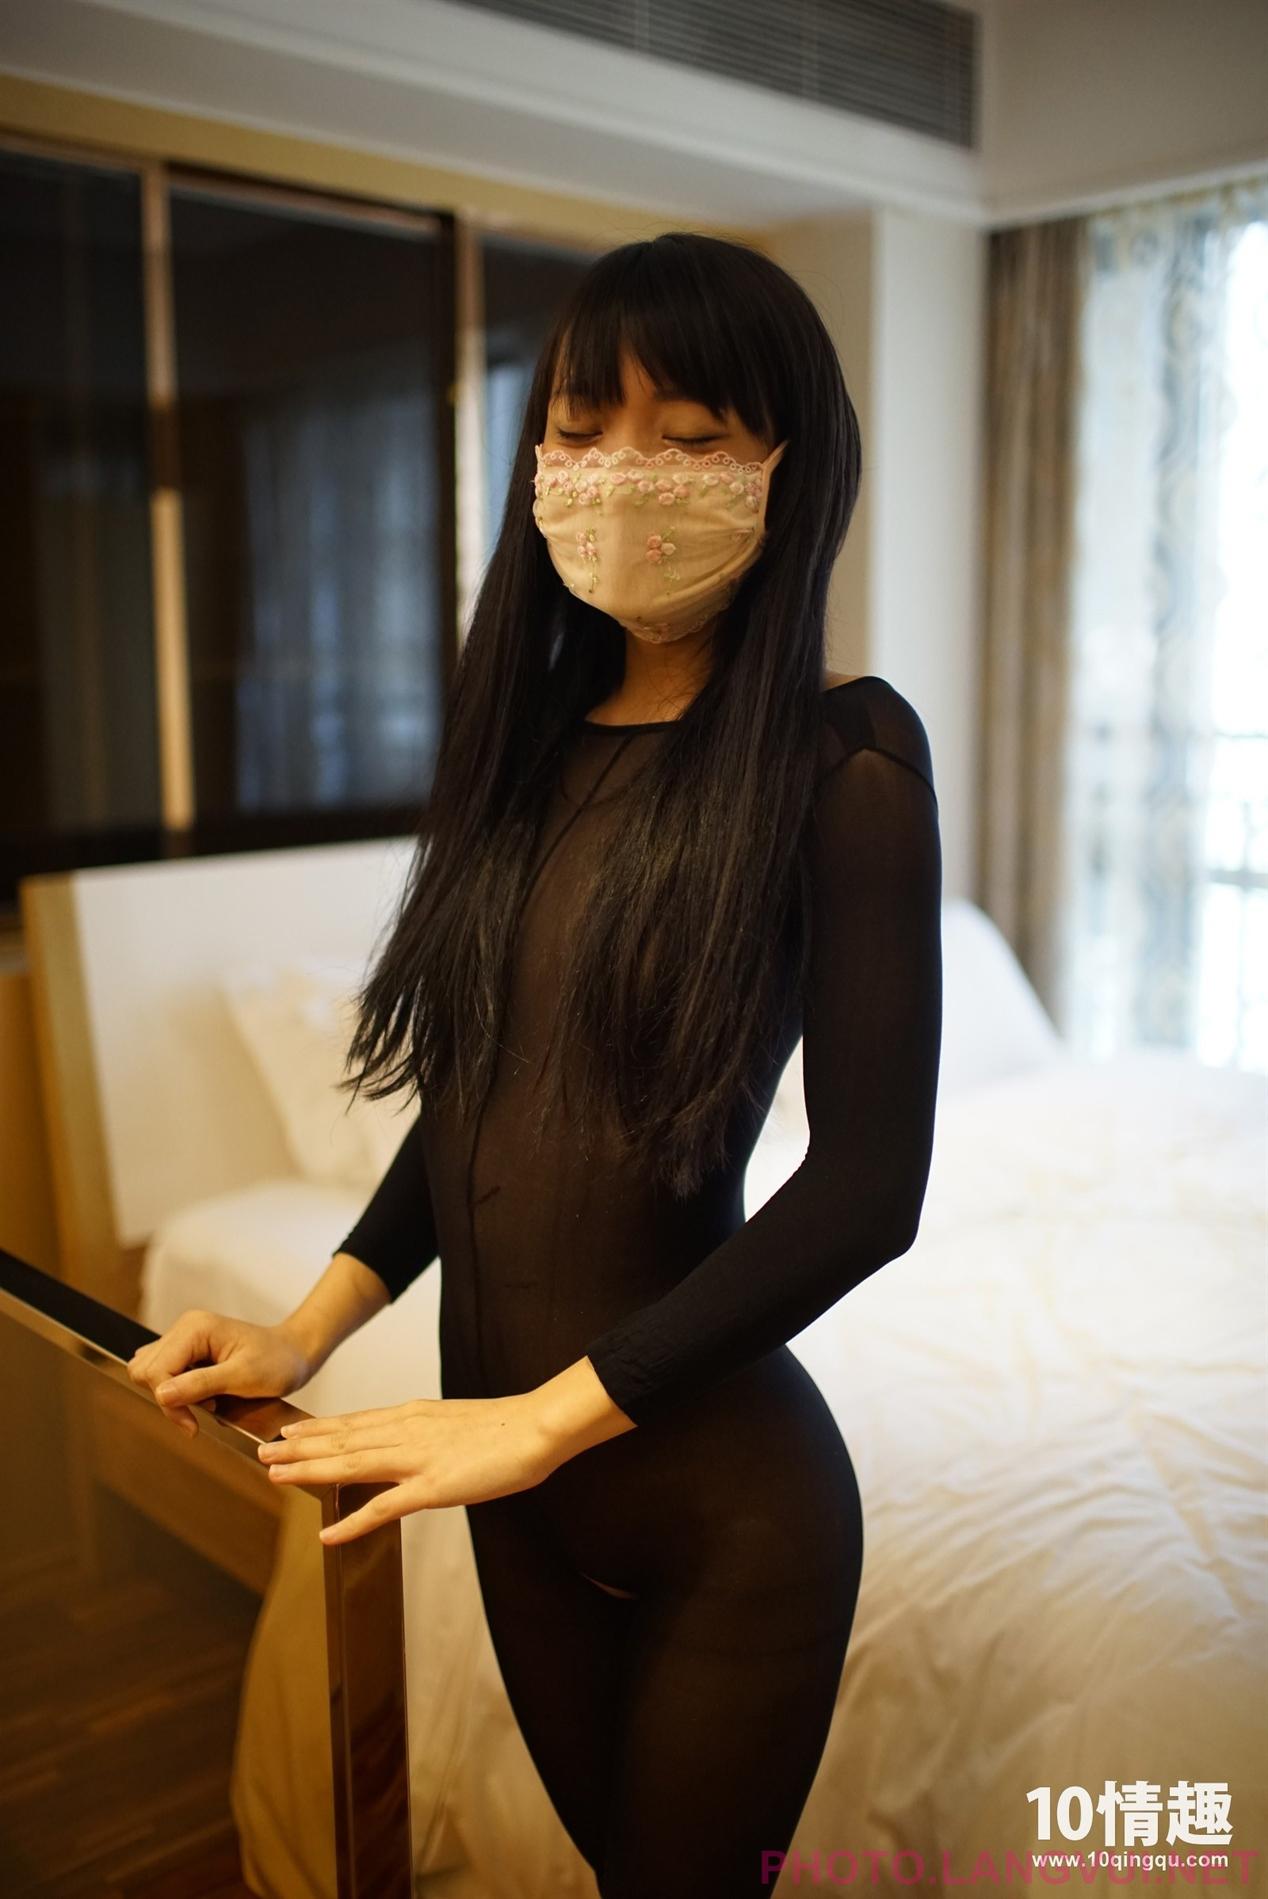 10QingQu Mask Series No 135